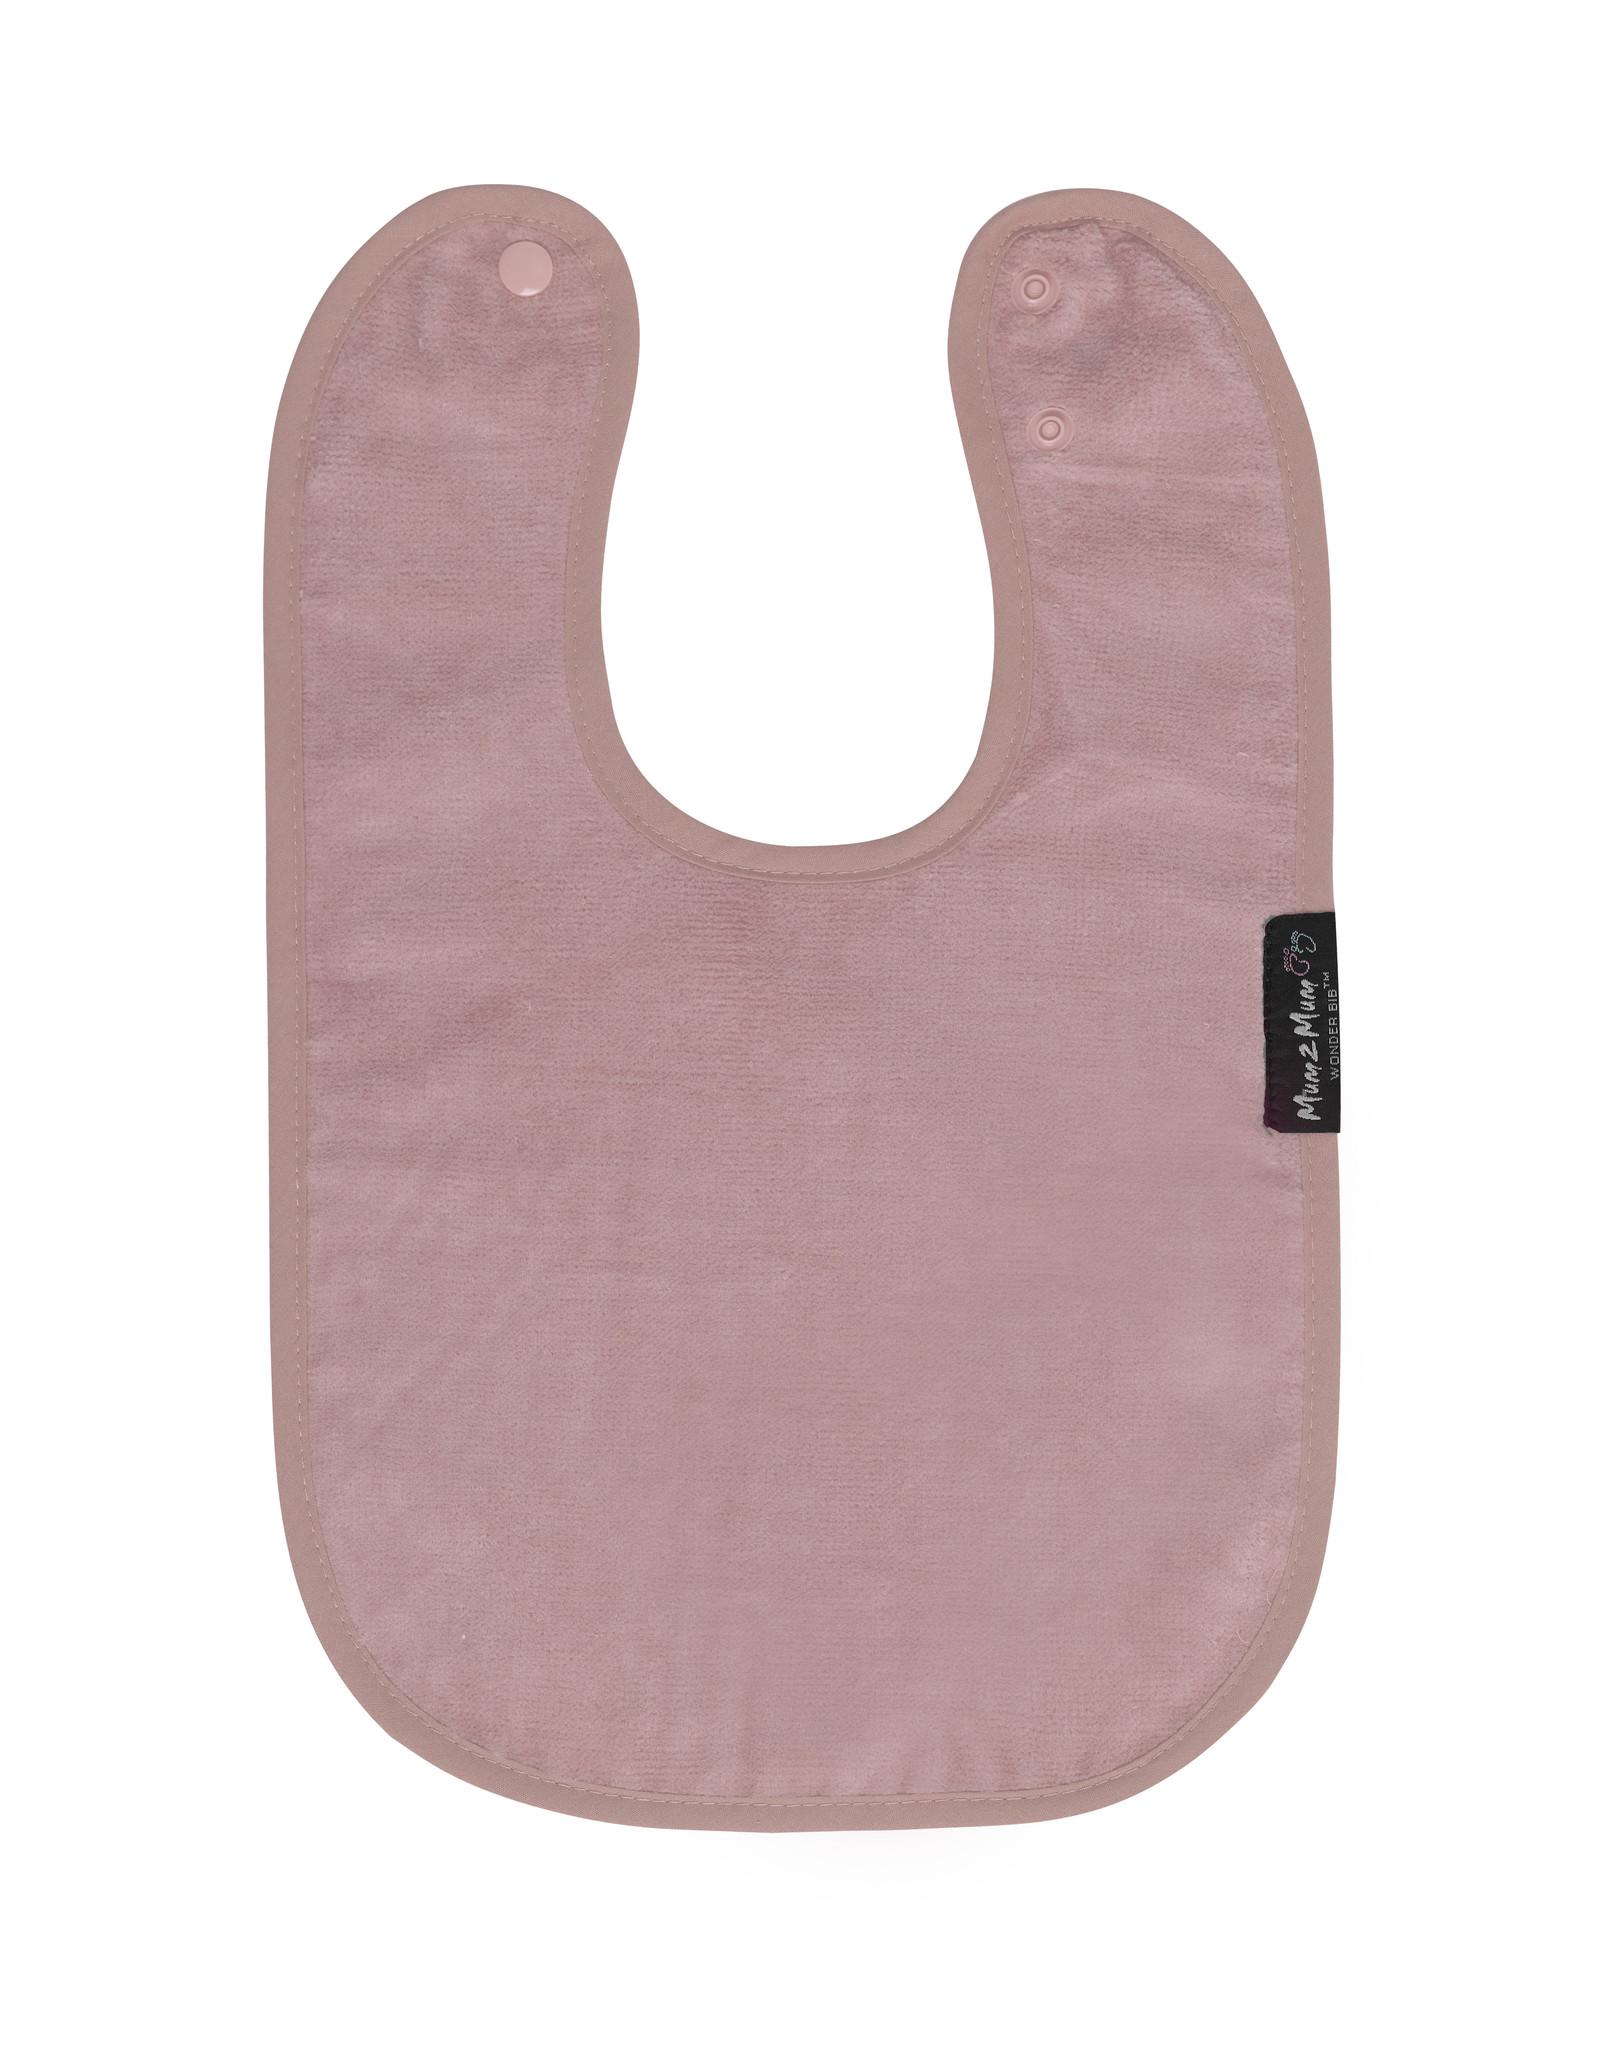 Mum2Mum Mum2Mum Standard Bib Dusty Pink 6 pieces